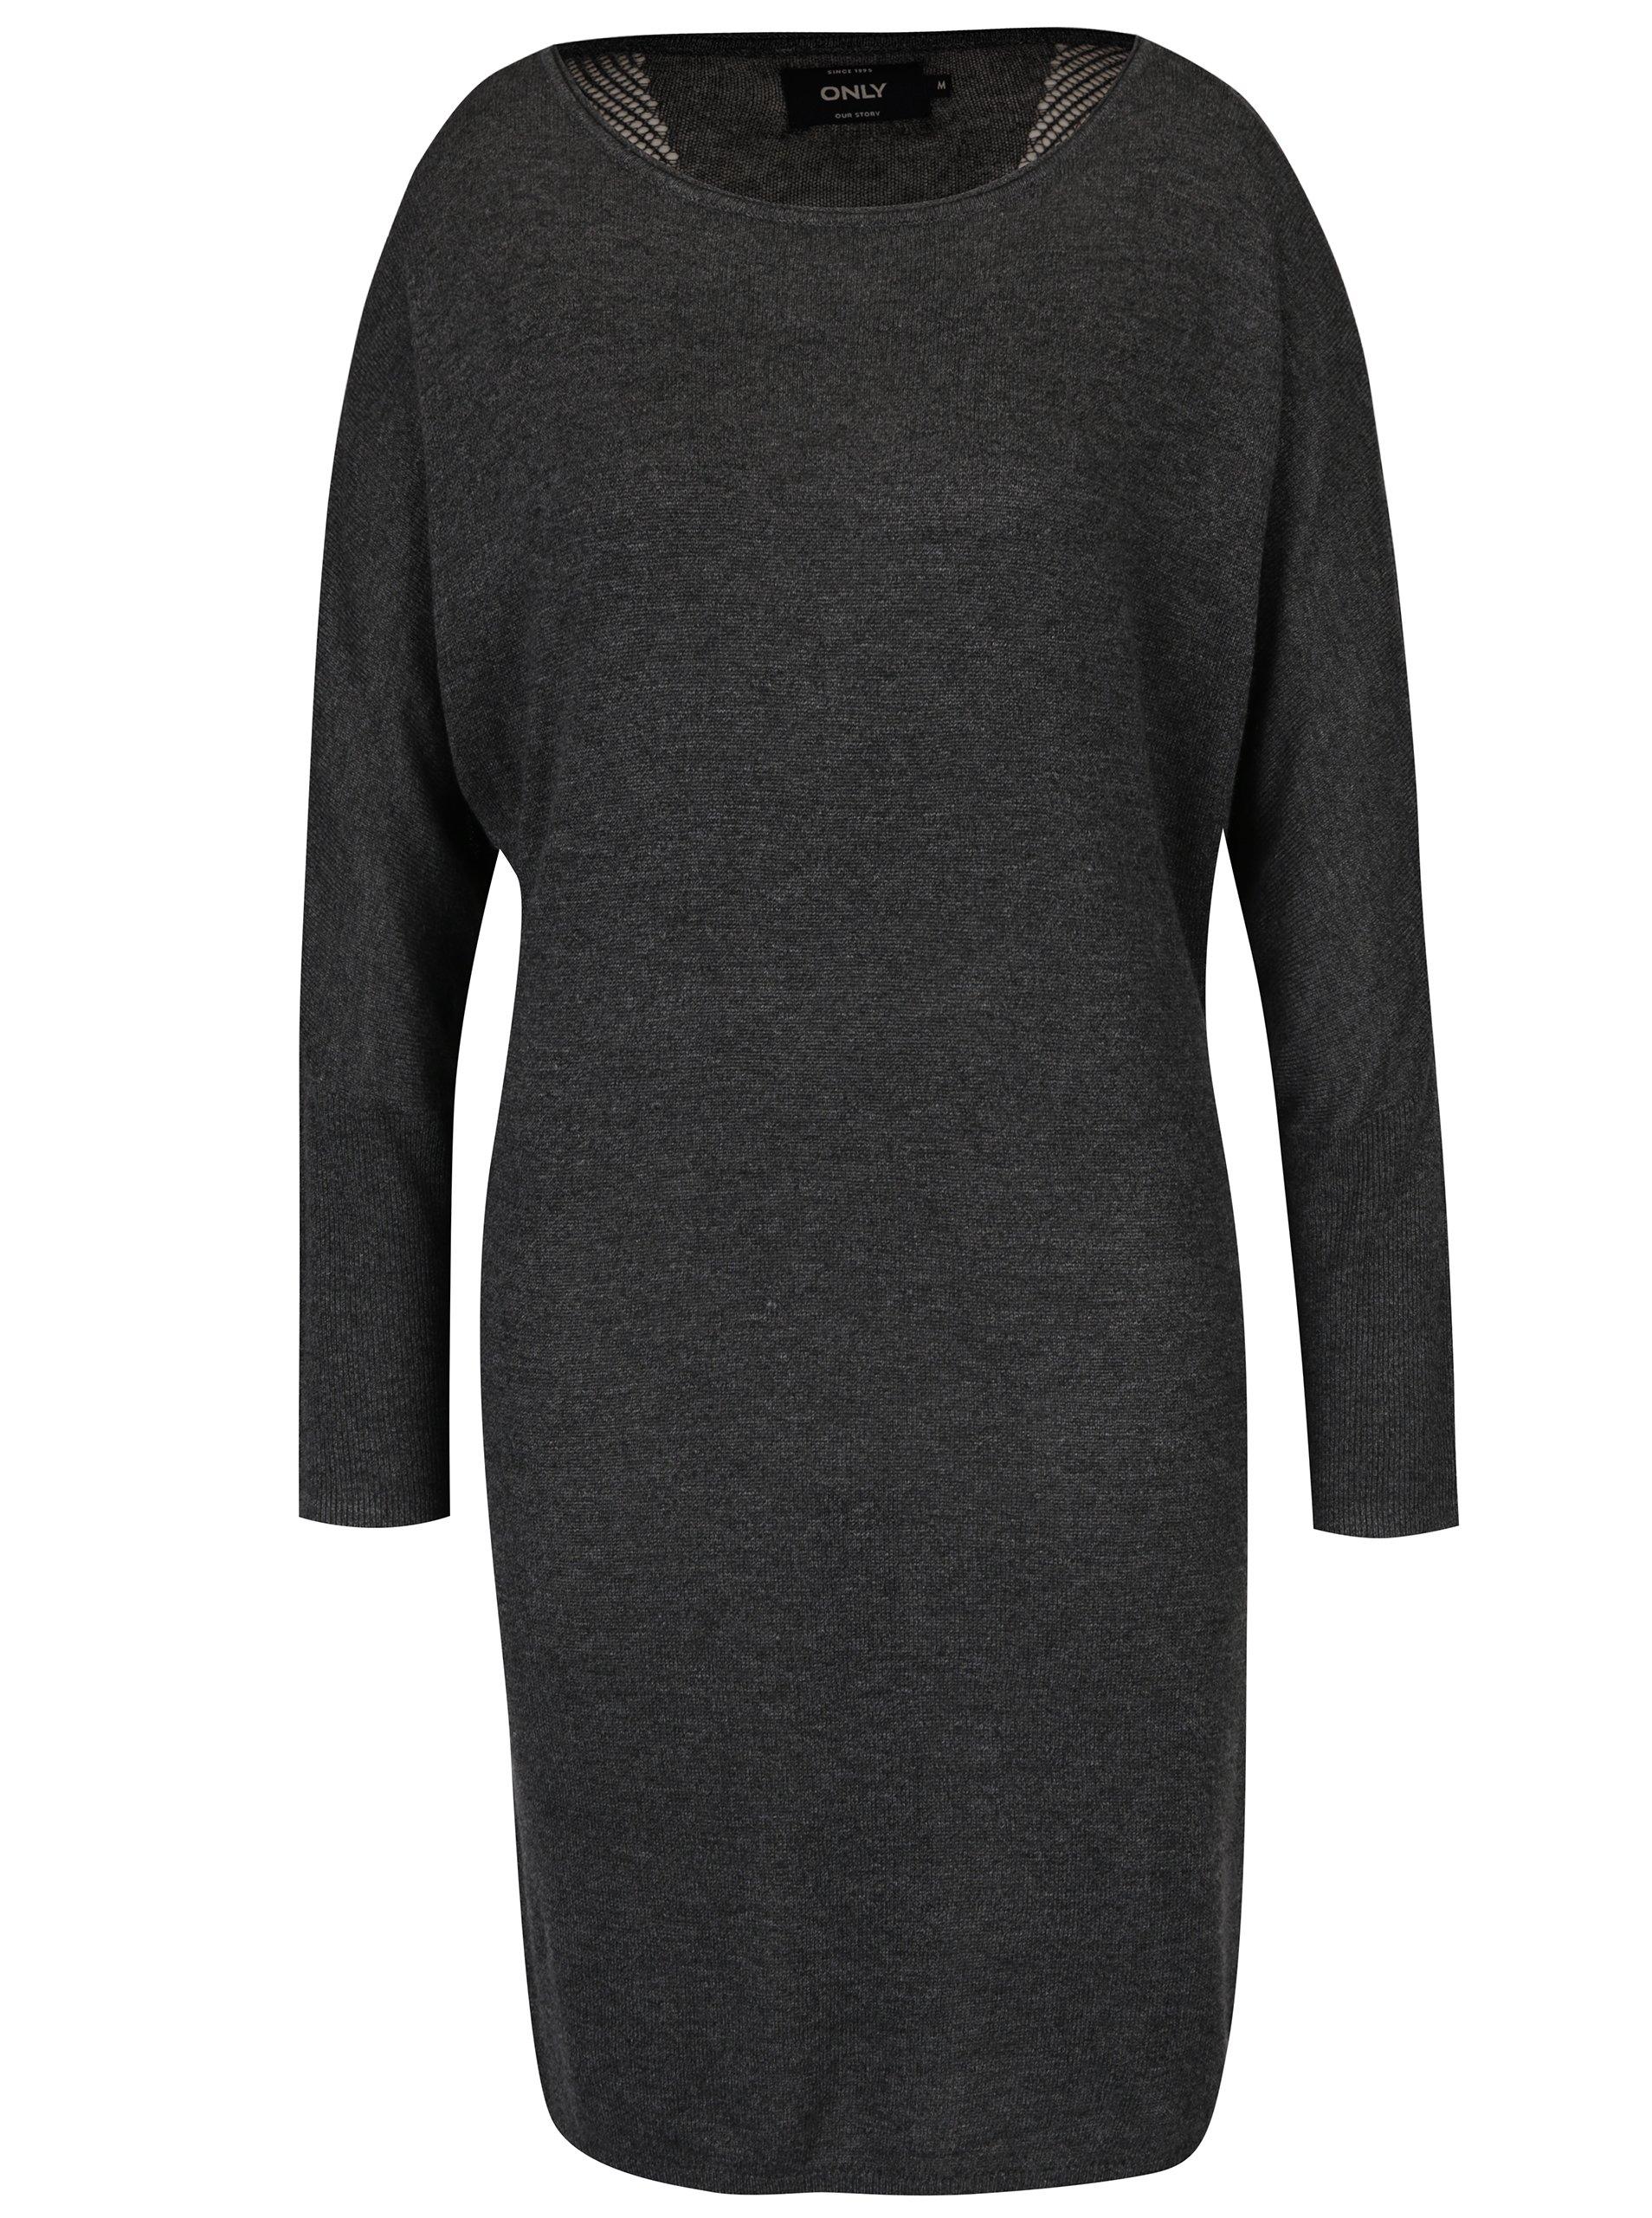 Tmavě šedé svetrové šaty s průsvitnými zády ONLY Polly